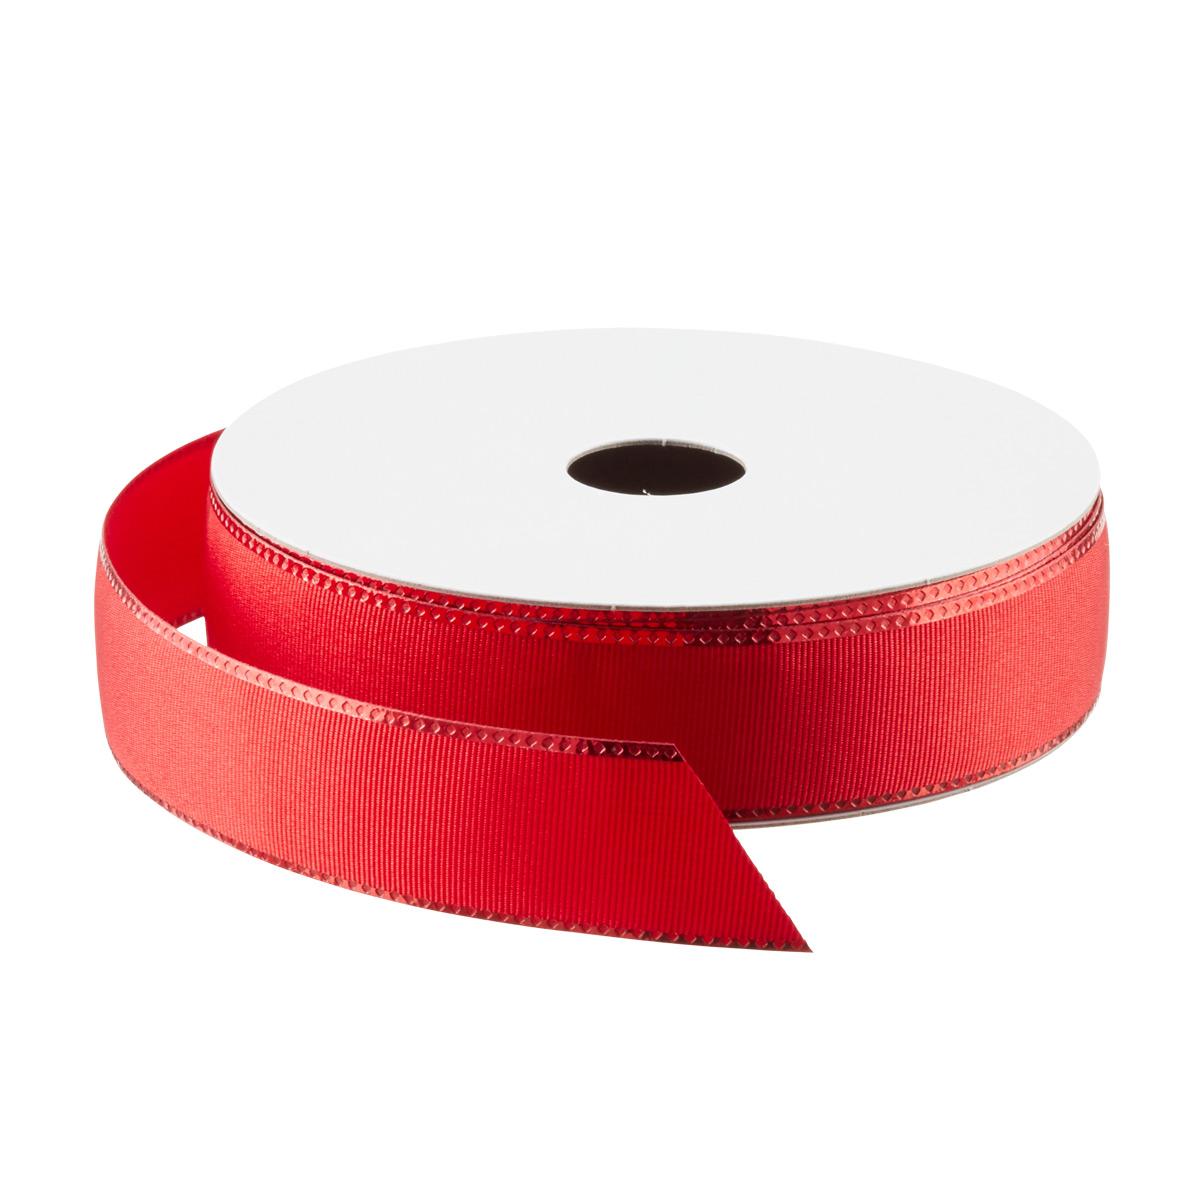 Ribbon Lenora Red